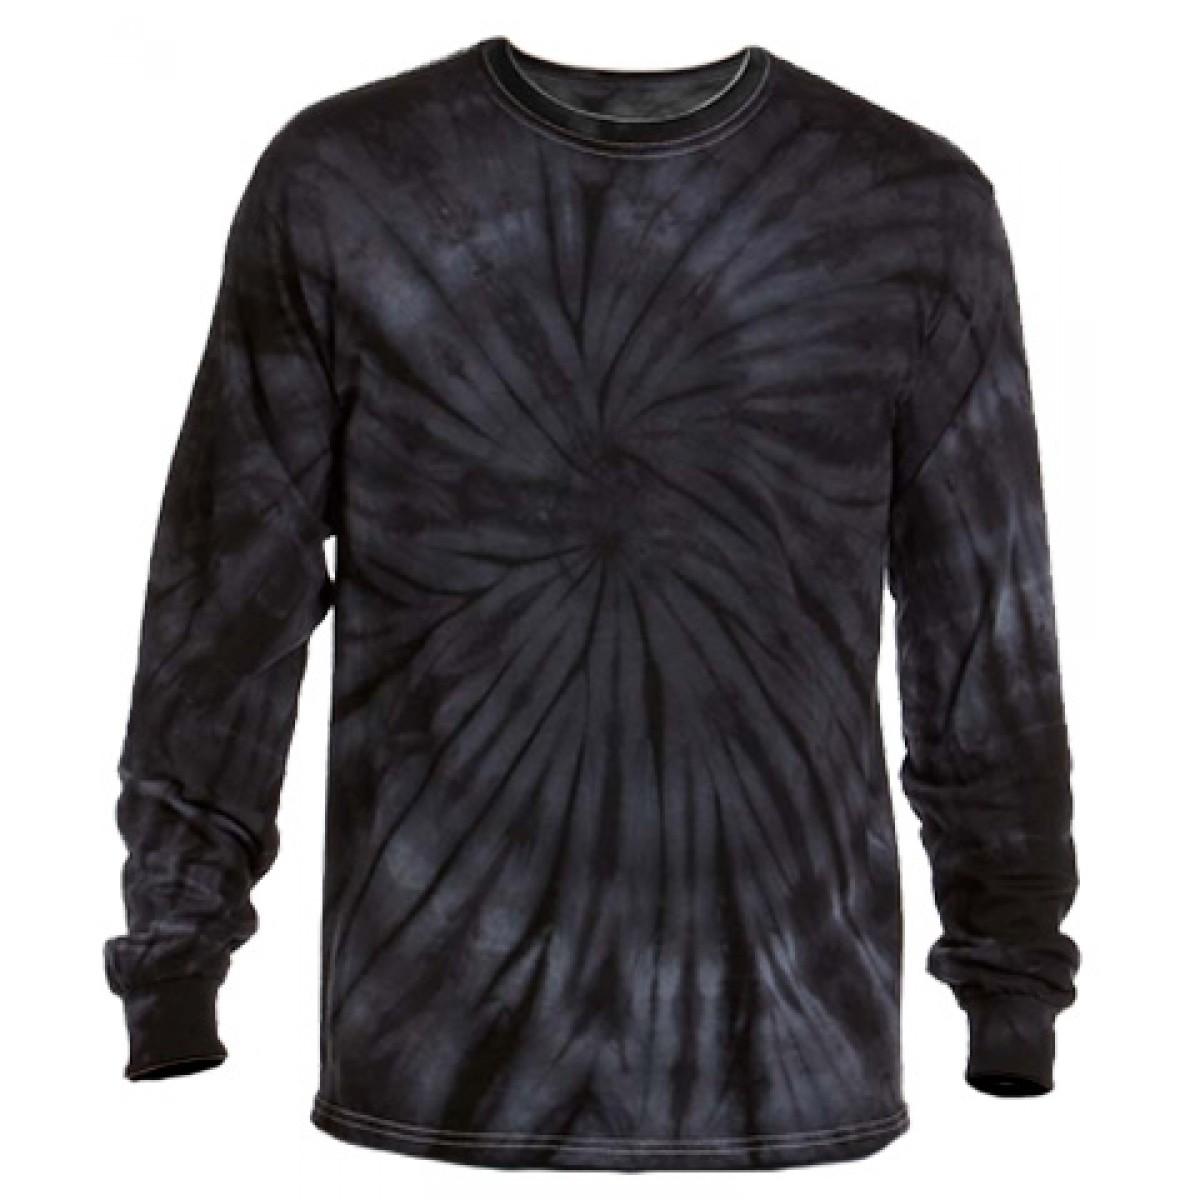 Multi Color Tie-Dye Long Sleeve Shirt -Gray -XL